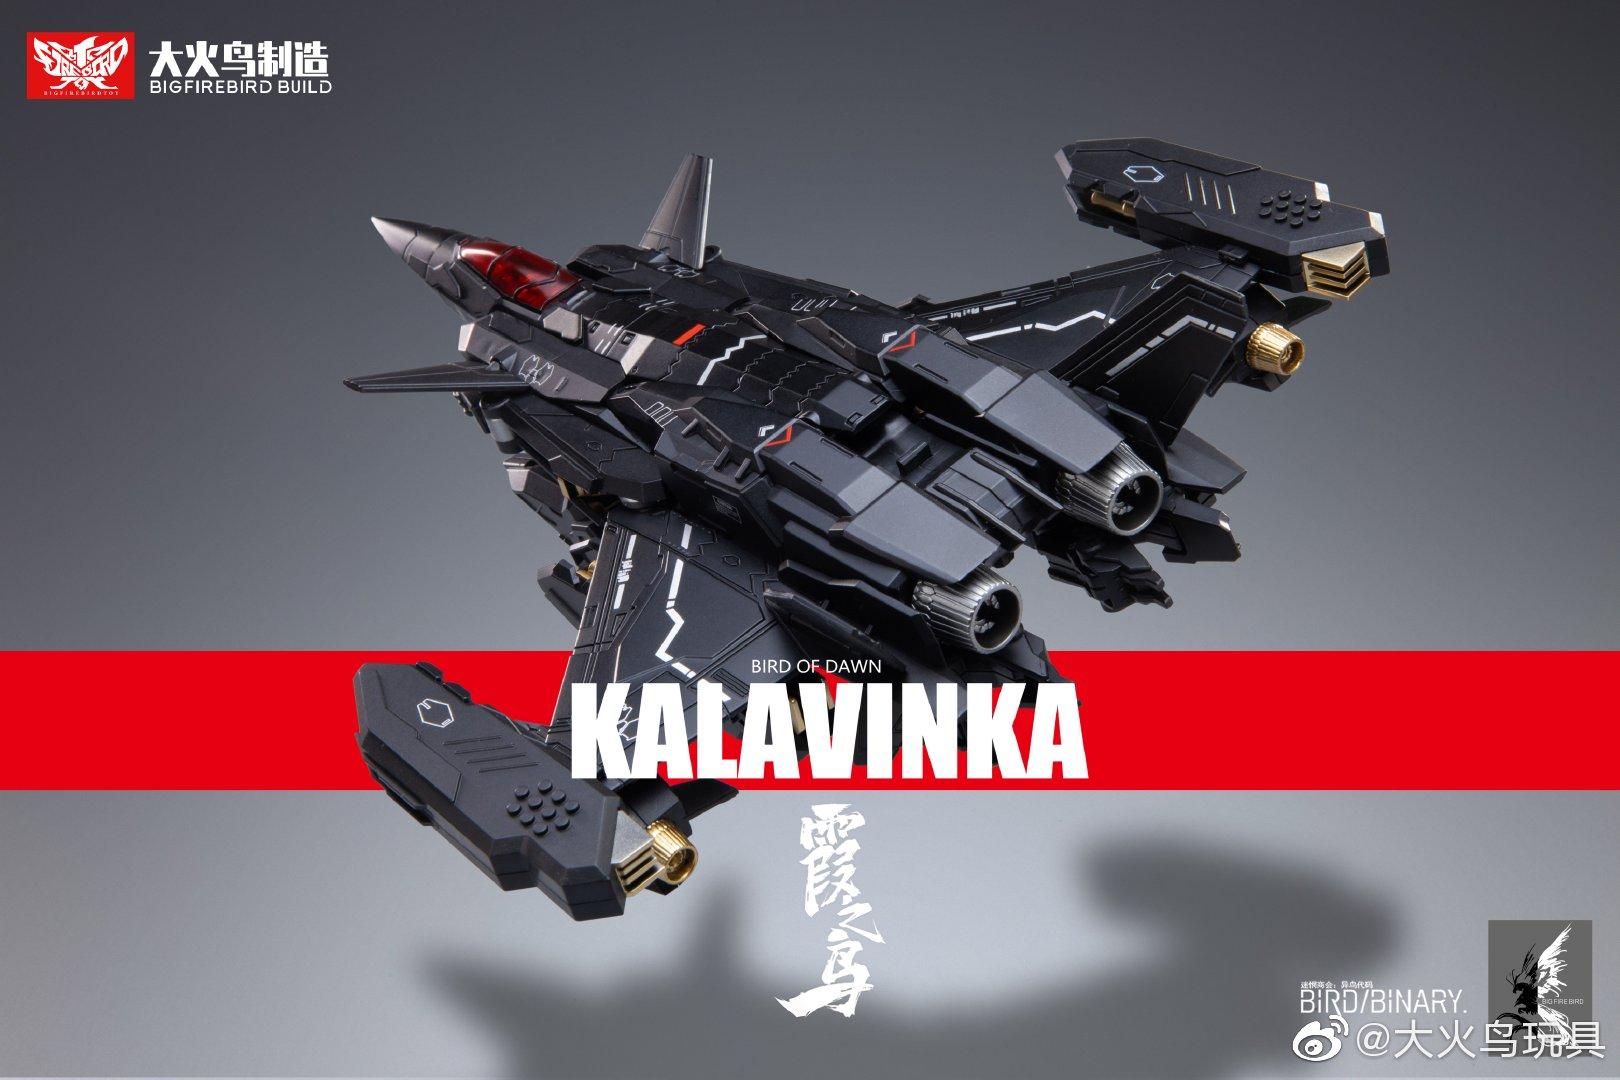 S507_KALAVINKA_BIRD_OF_DAWN_005.jpg